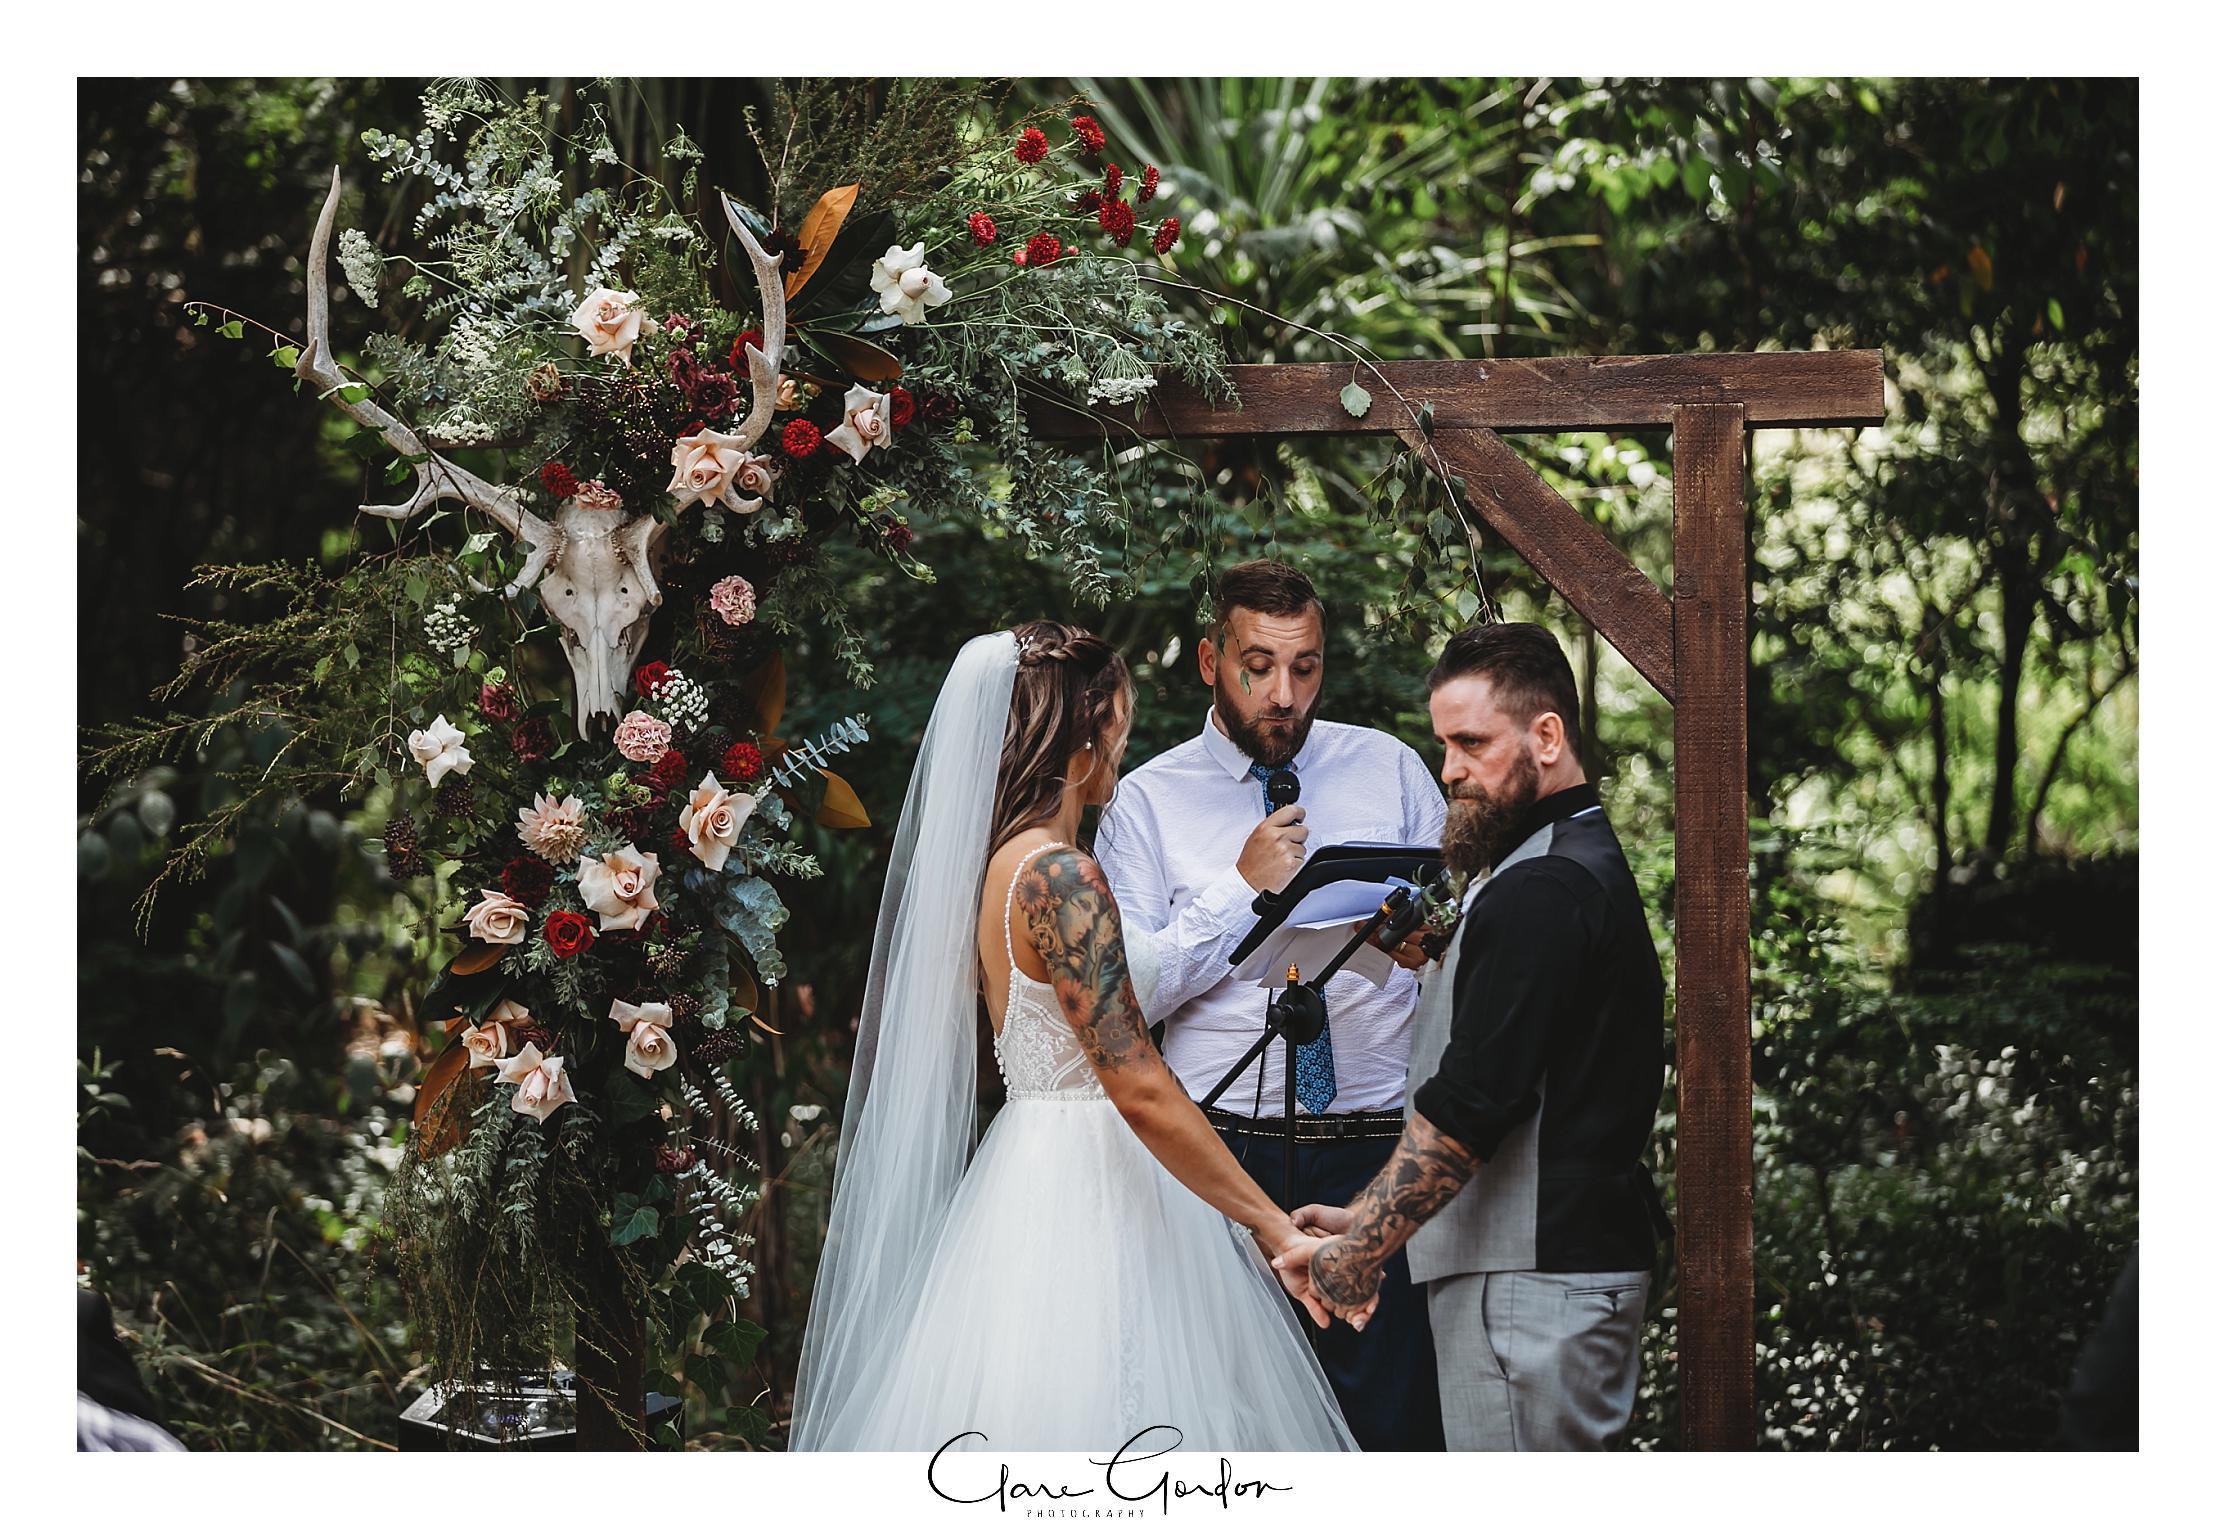 Waikato-wedding-photographer-Forest-weddnig-Hamilton-wedding-Newzealand (72).jpg